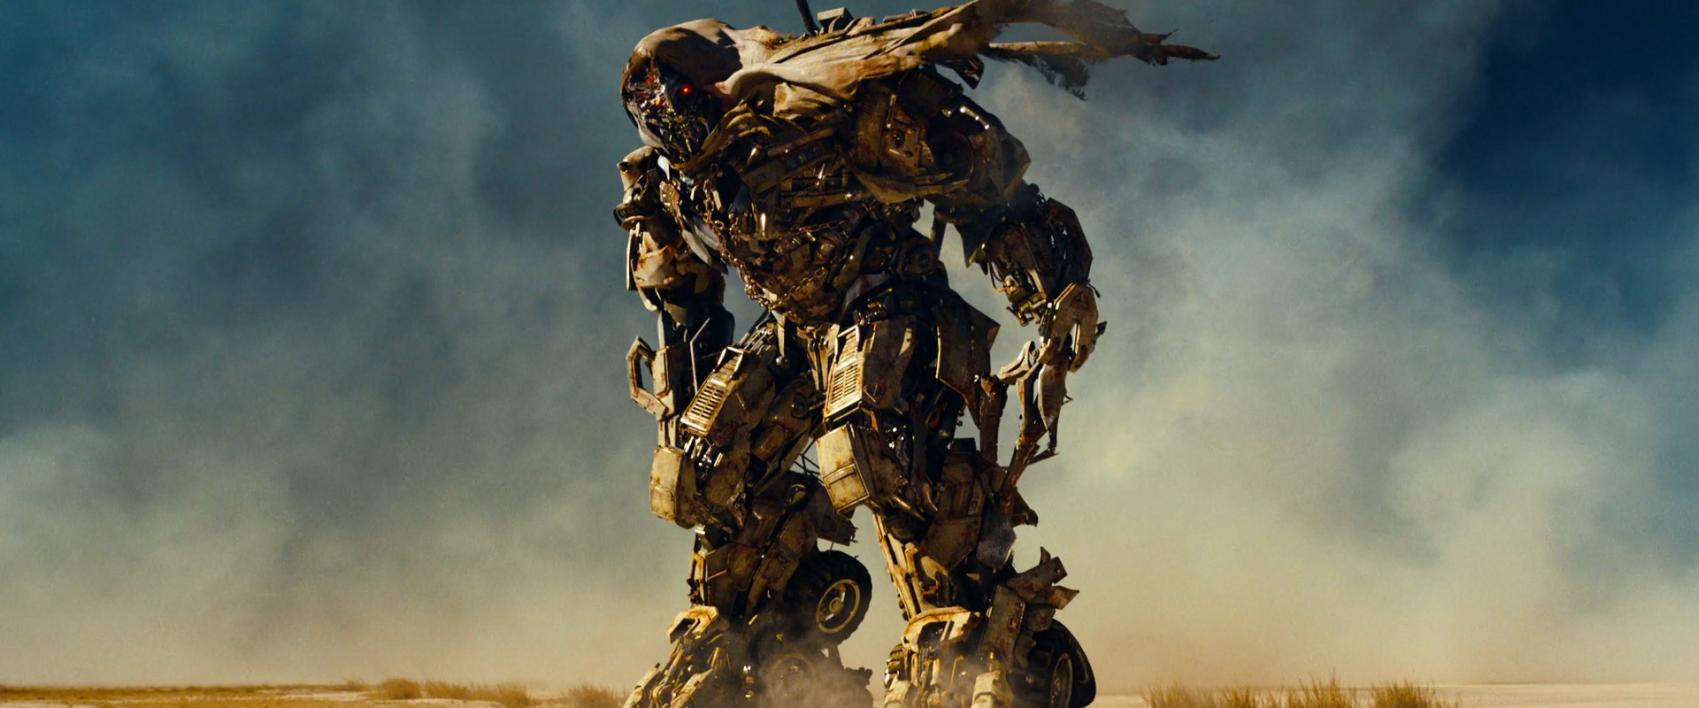 Film Transformers The Last Knight Online